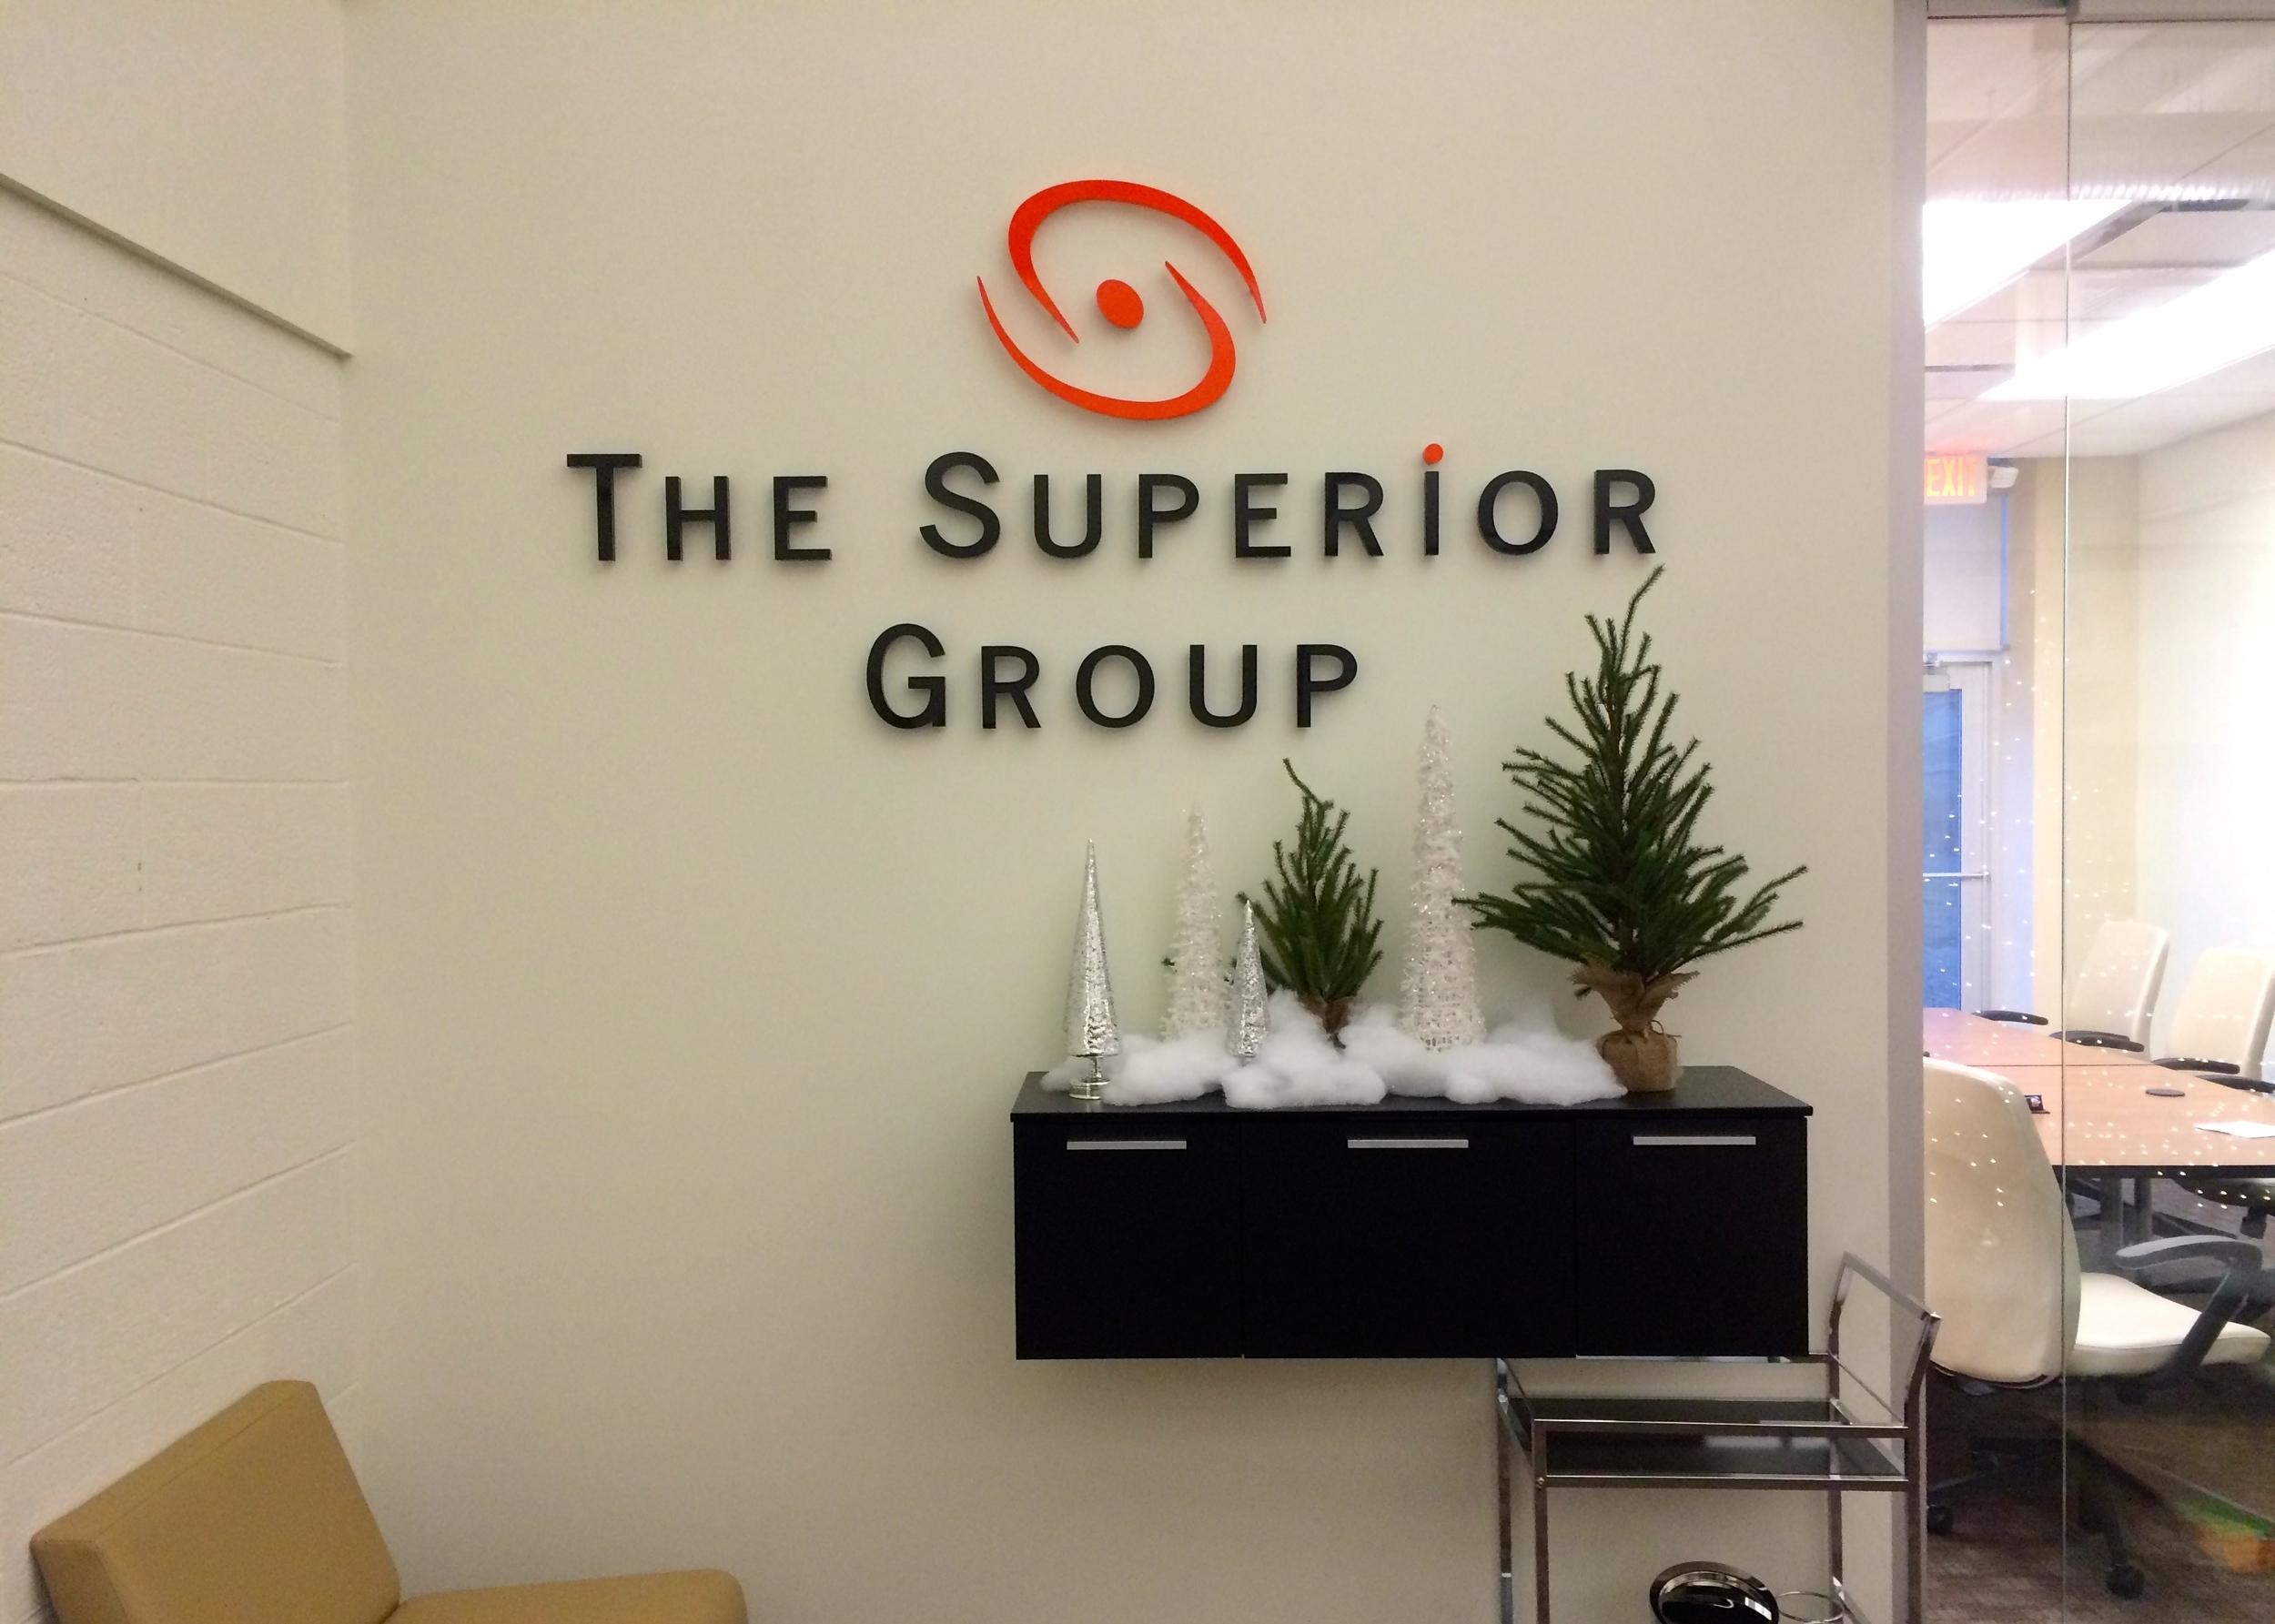 2014.12.17 The Superior Group Wall Logo.JPG